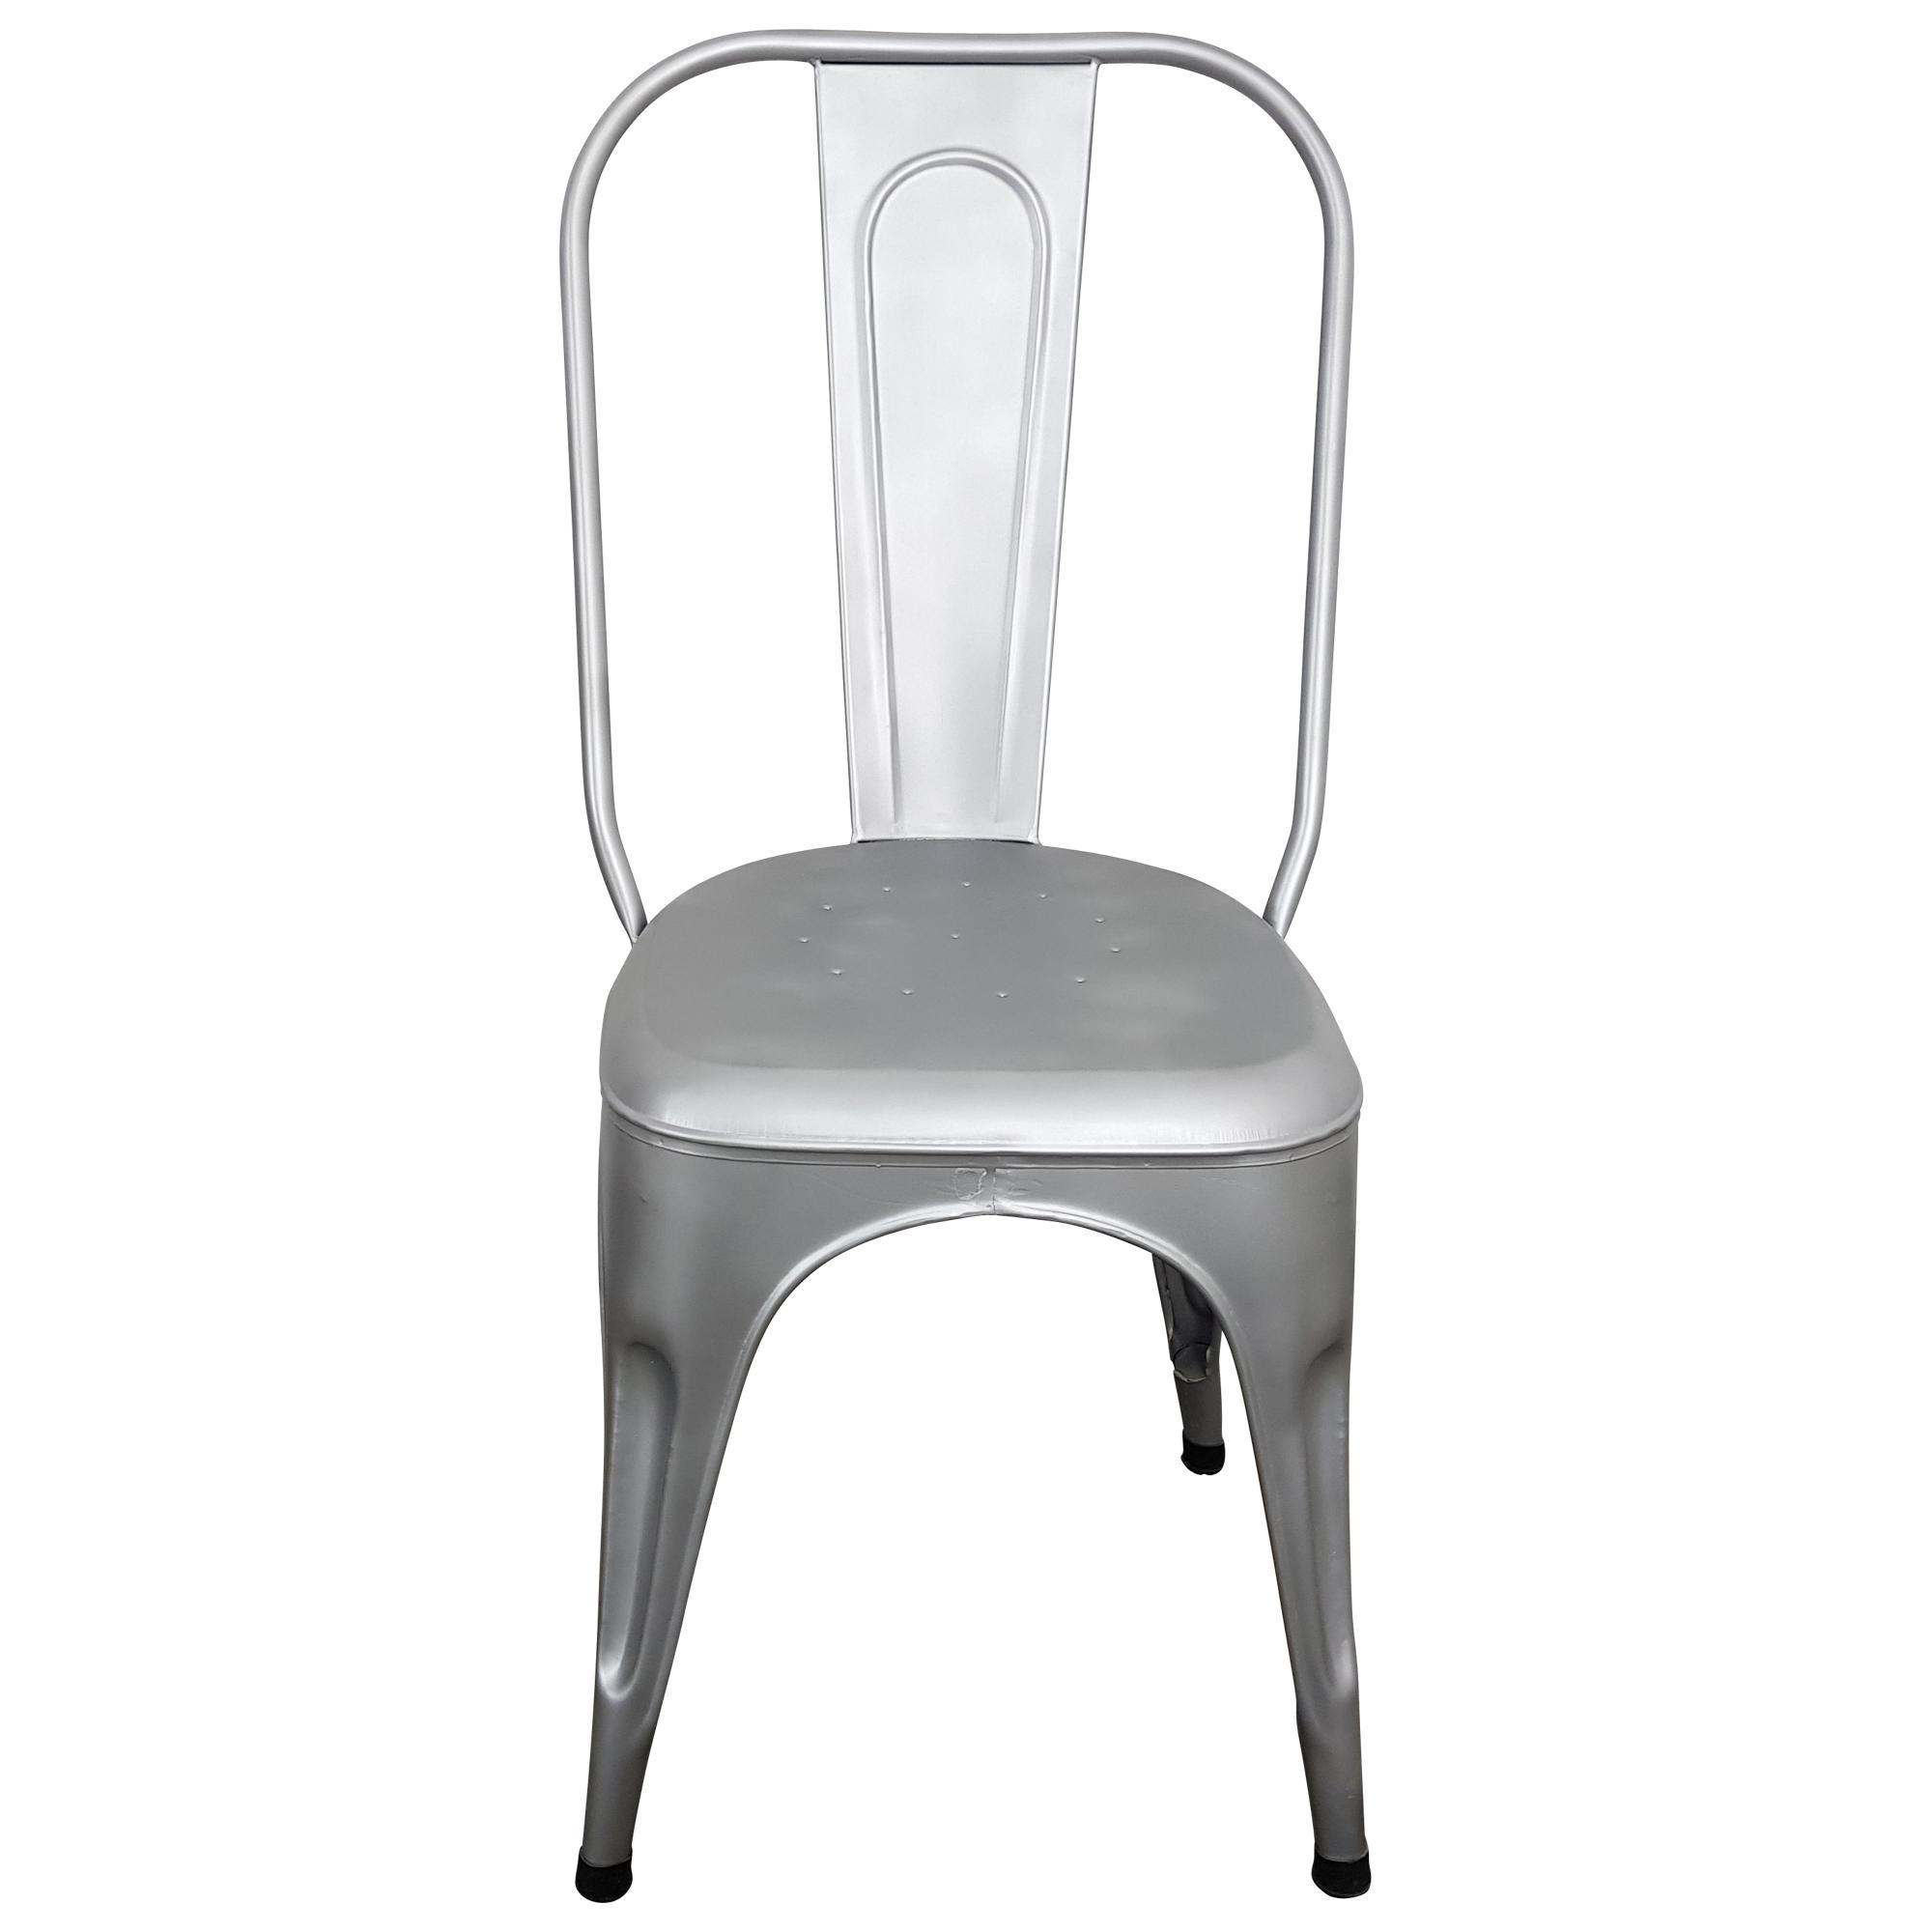 Stuhl Metall Industrie Design Silber grau stapelbar